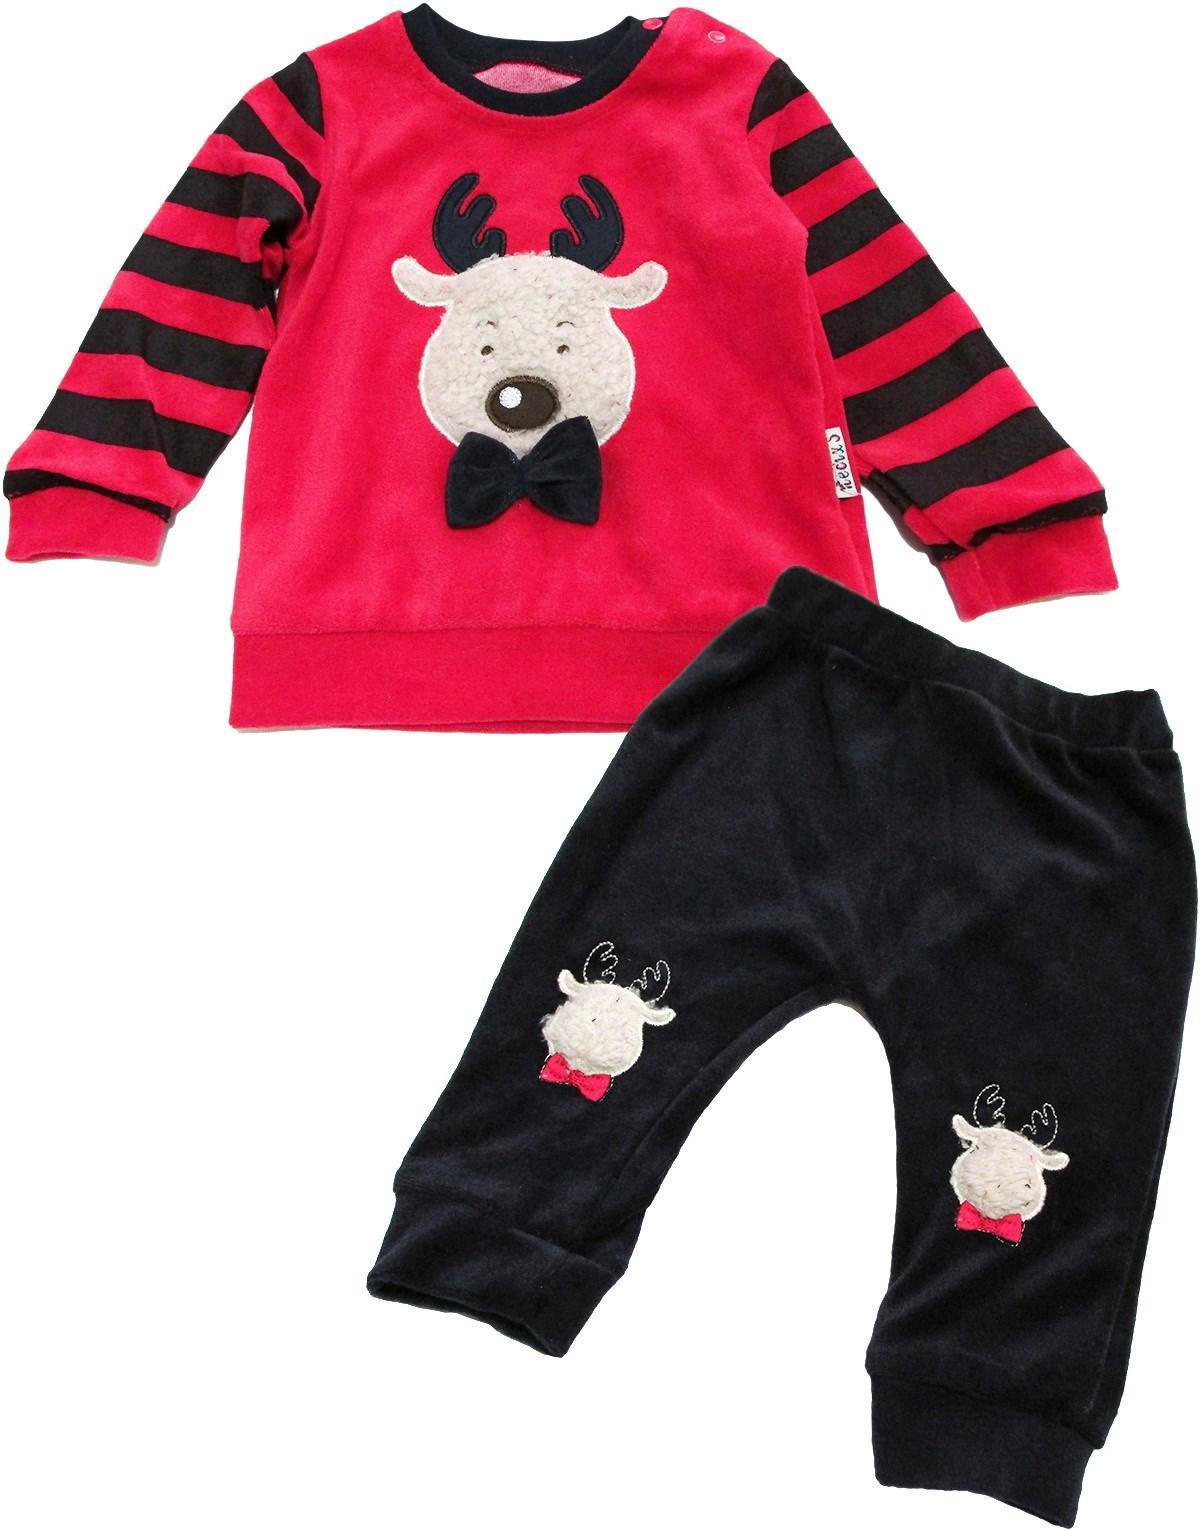 <strong>0-3 Ay Erkek Bebek Giyimin Önemi</strong>